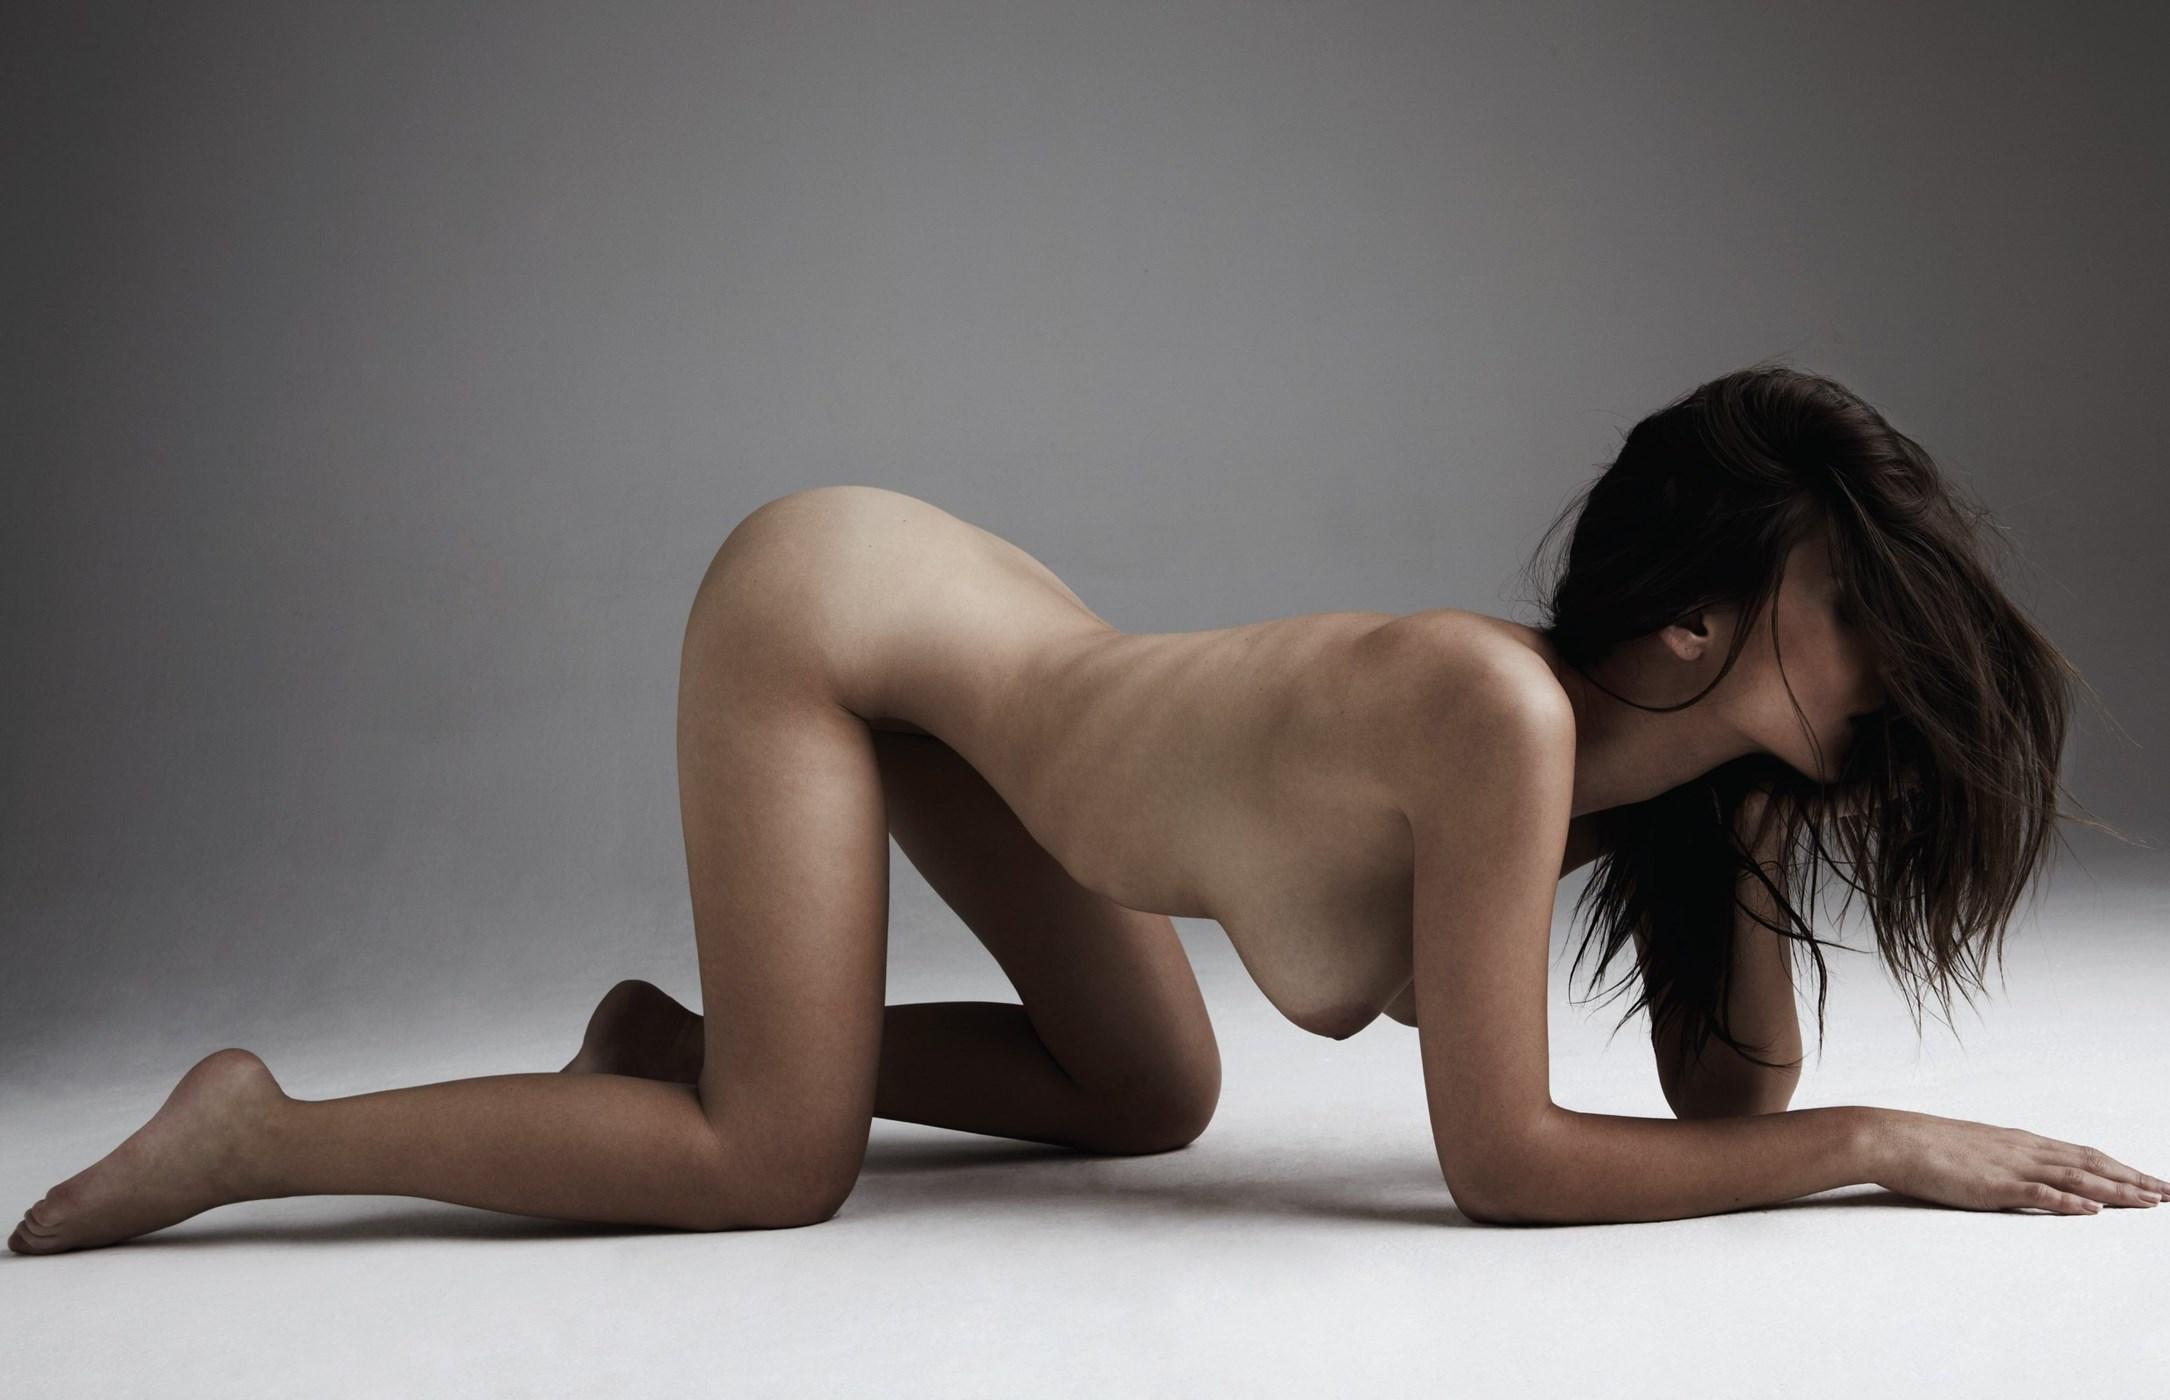 Emily Ratajkowski nude photos for Treats Magazine The Fappening 2018